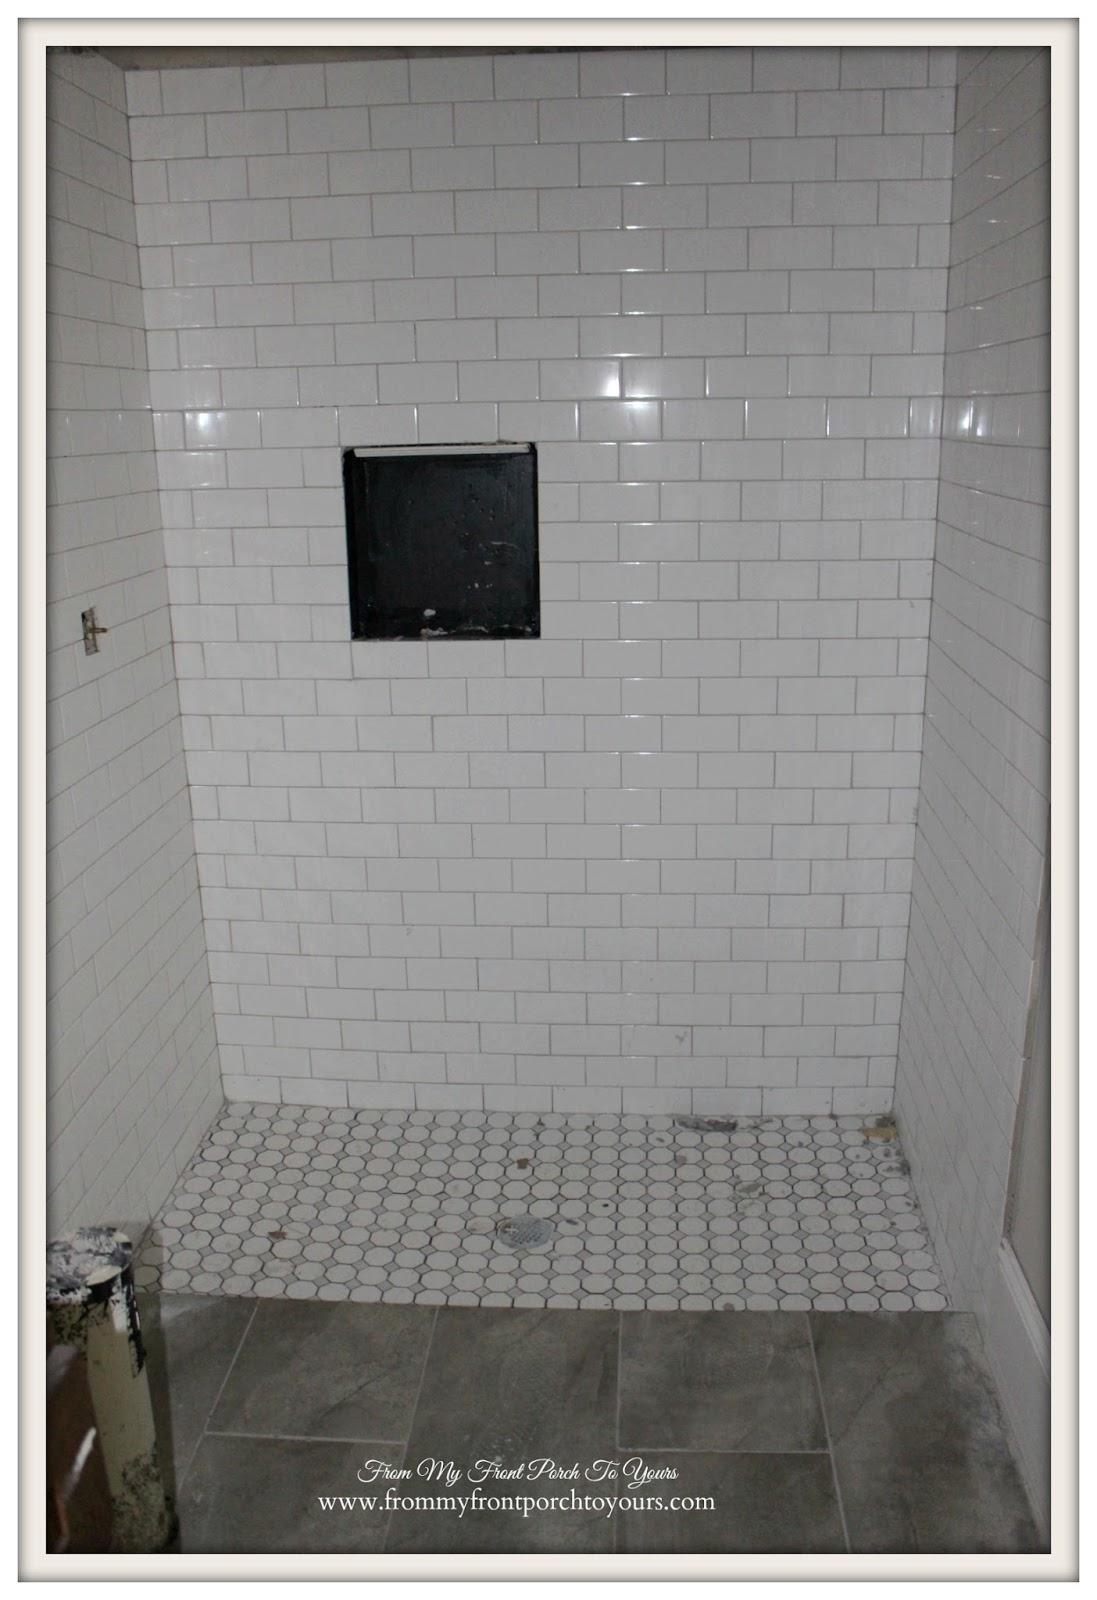 From My Front Porch To Yours: Suburban Farmhouse Bathroom ... on Farmhouse Bathroom Tile  id=74641